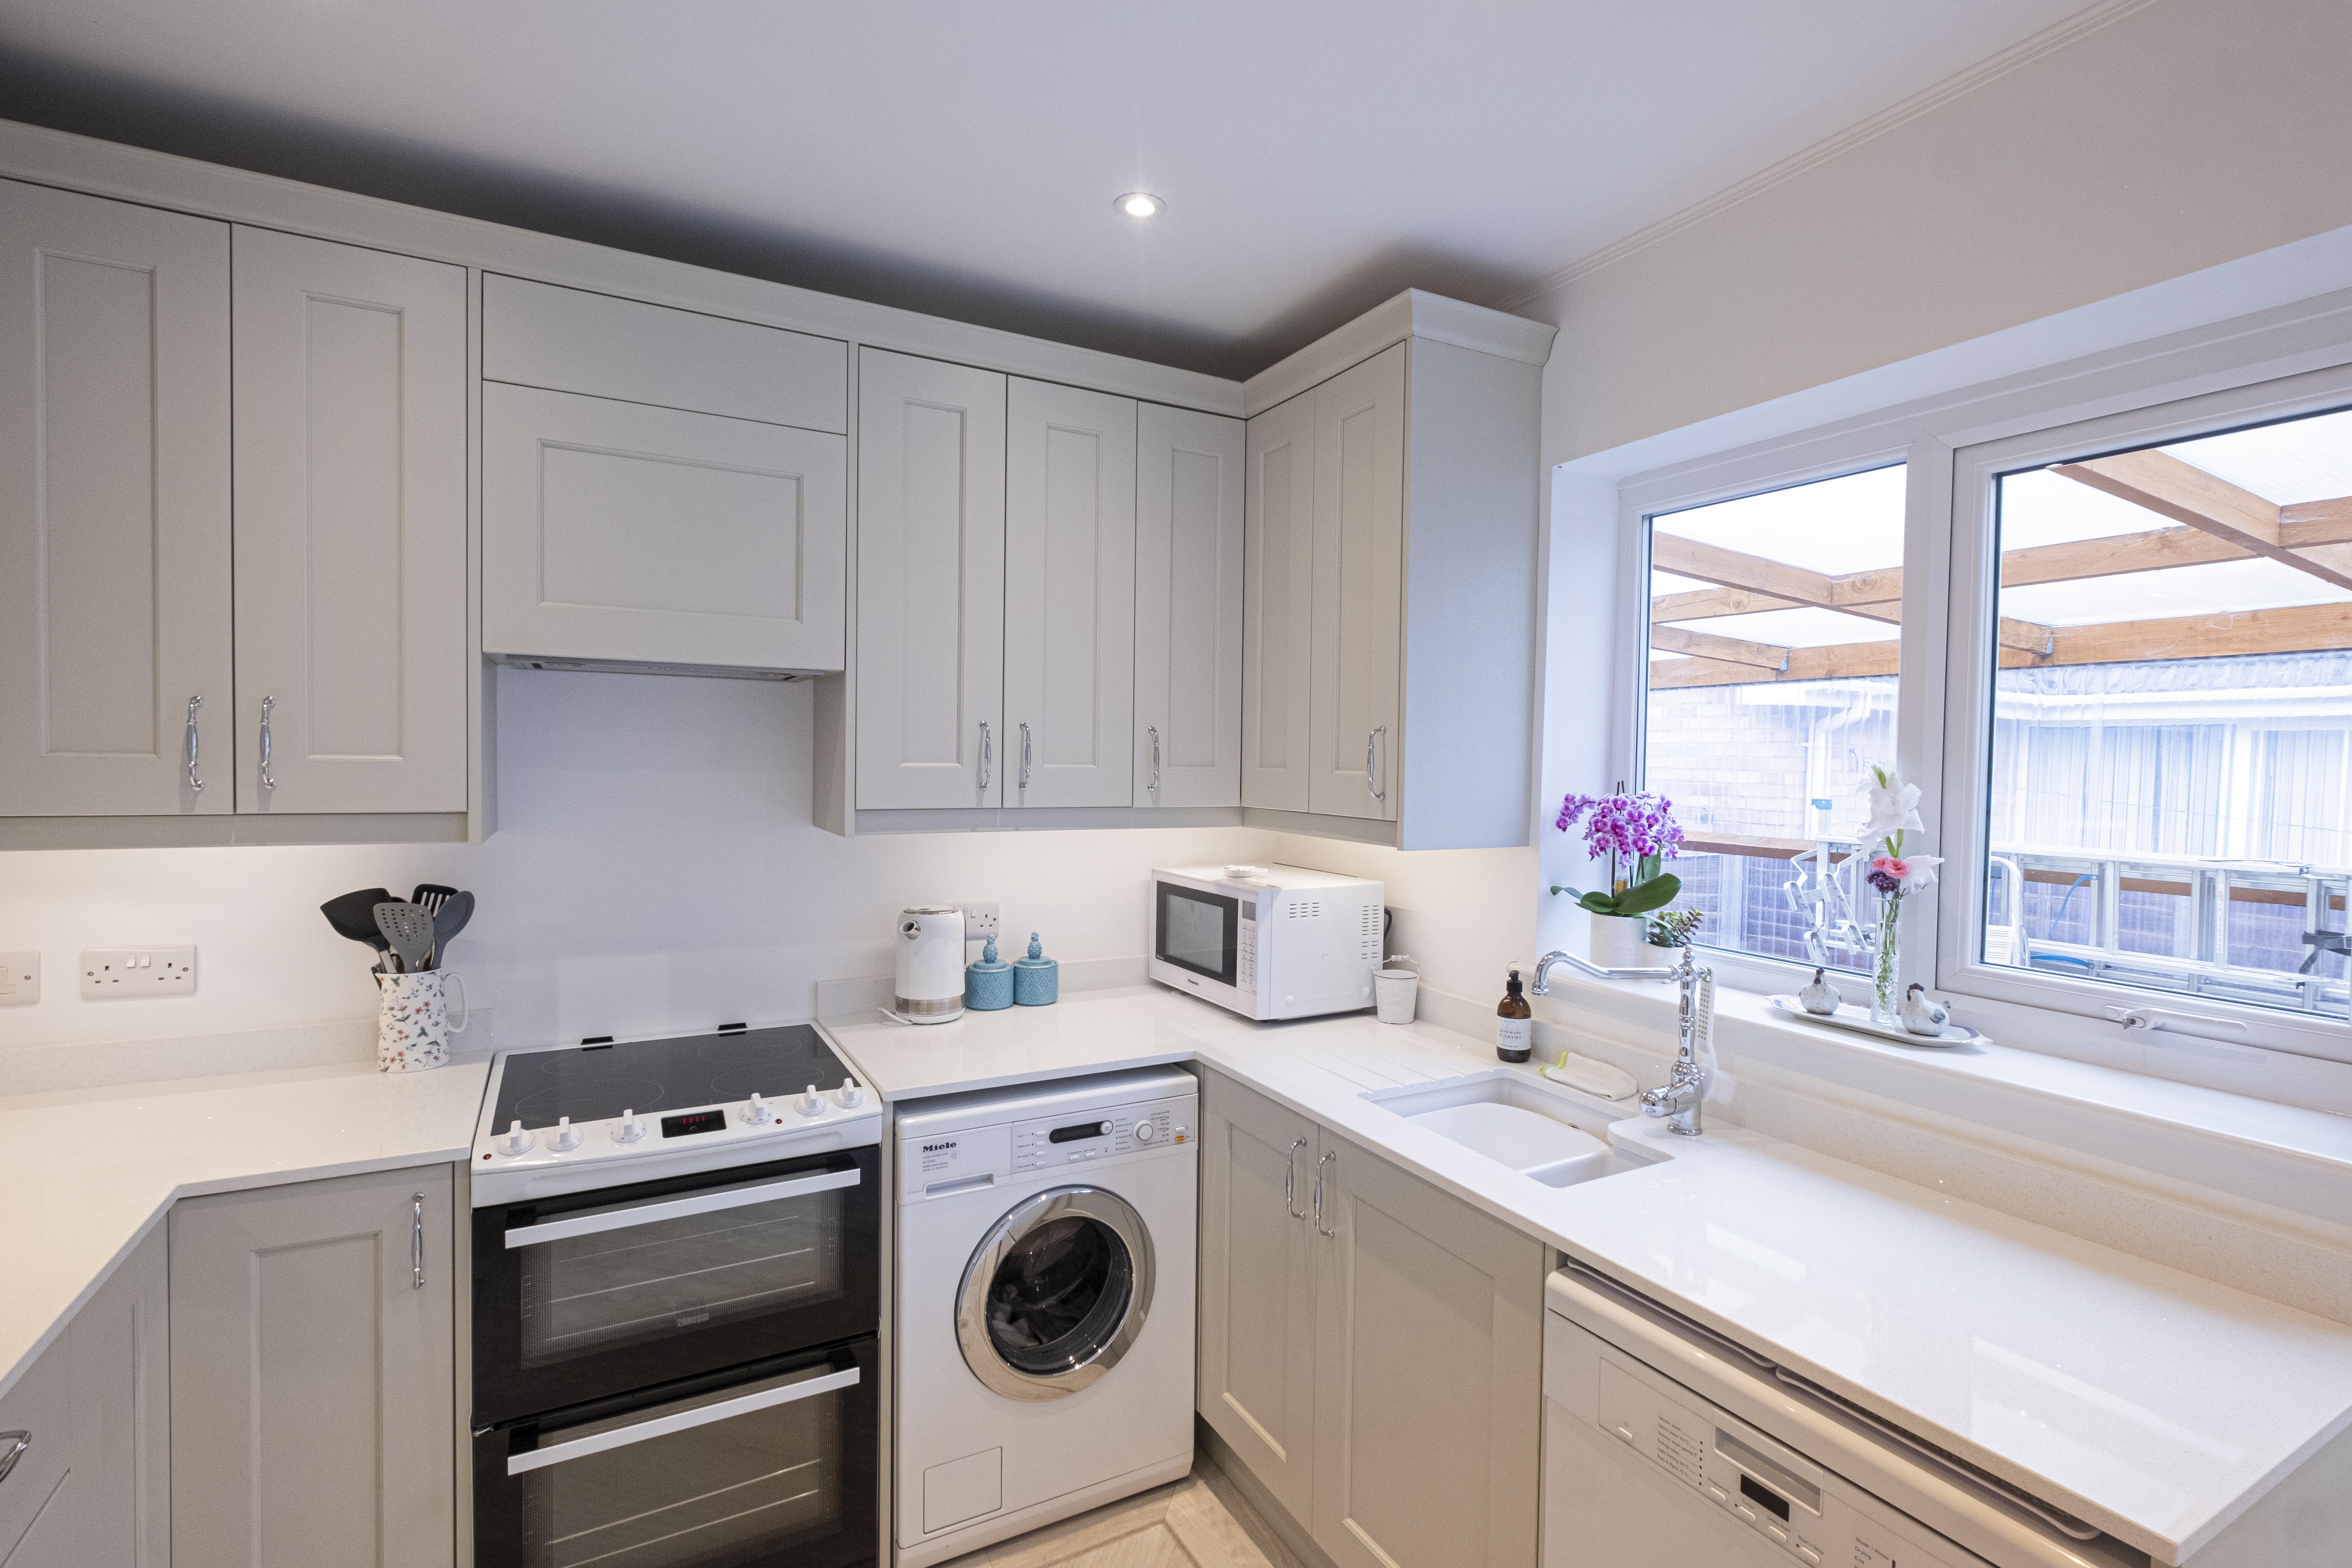 Mussel Shaker kitchen by Charmaine ULYATE | Raison Home UK - 6